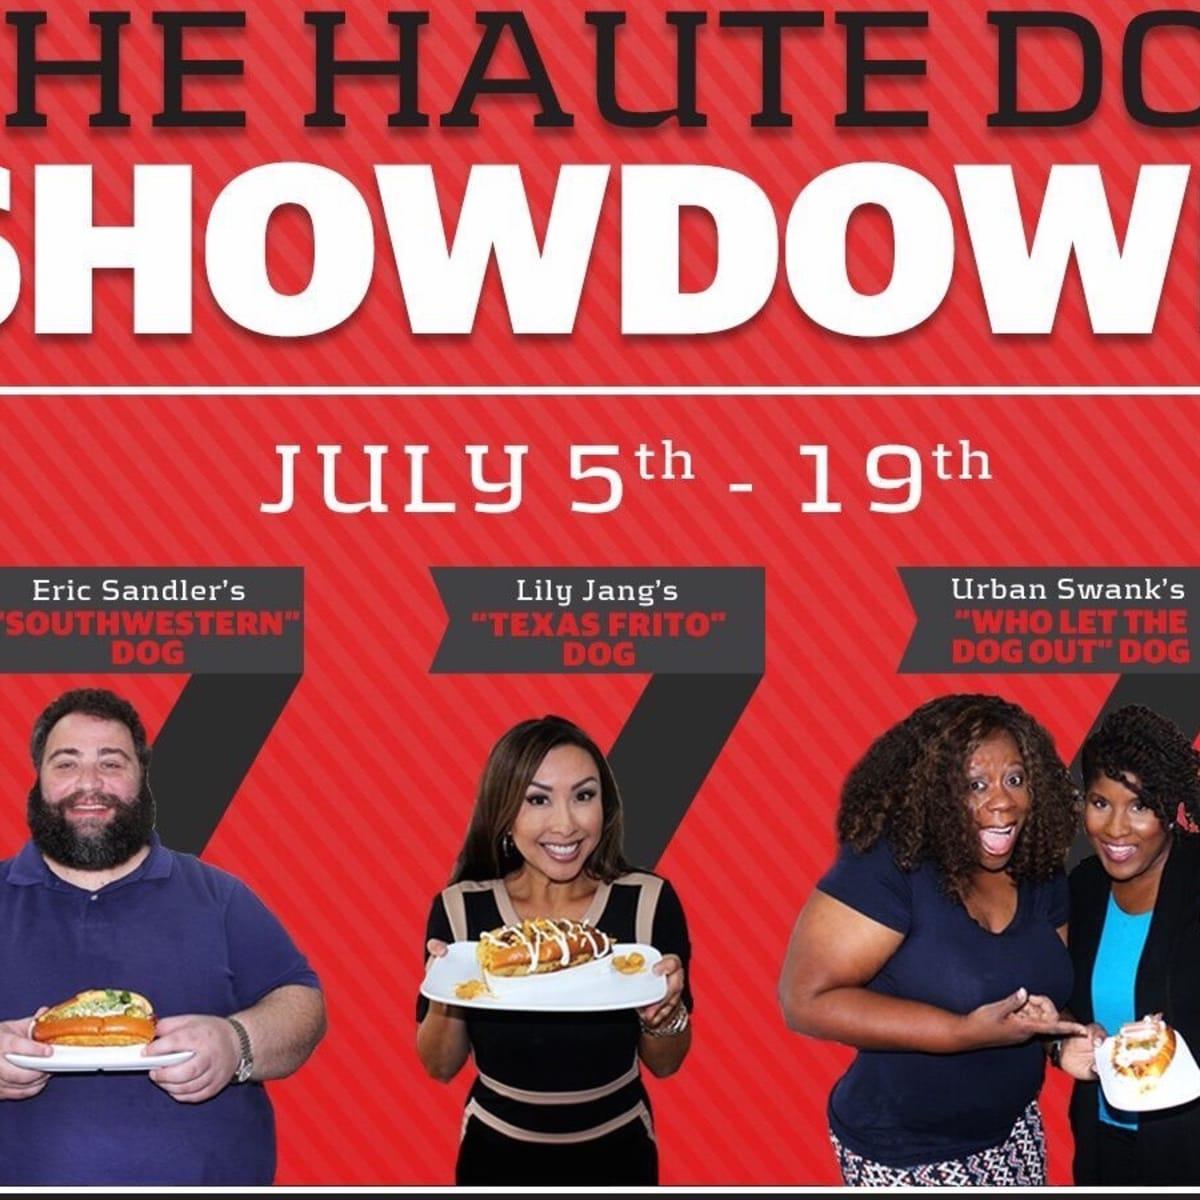 James Coney Island Haute Dog Showdown